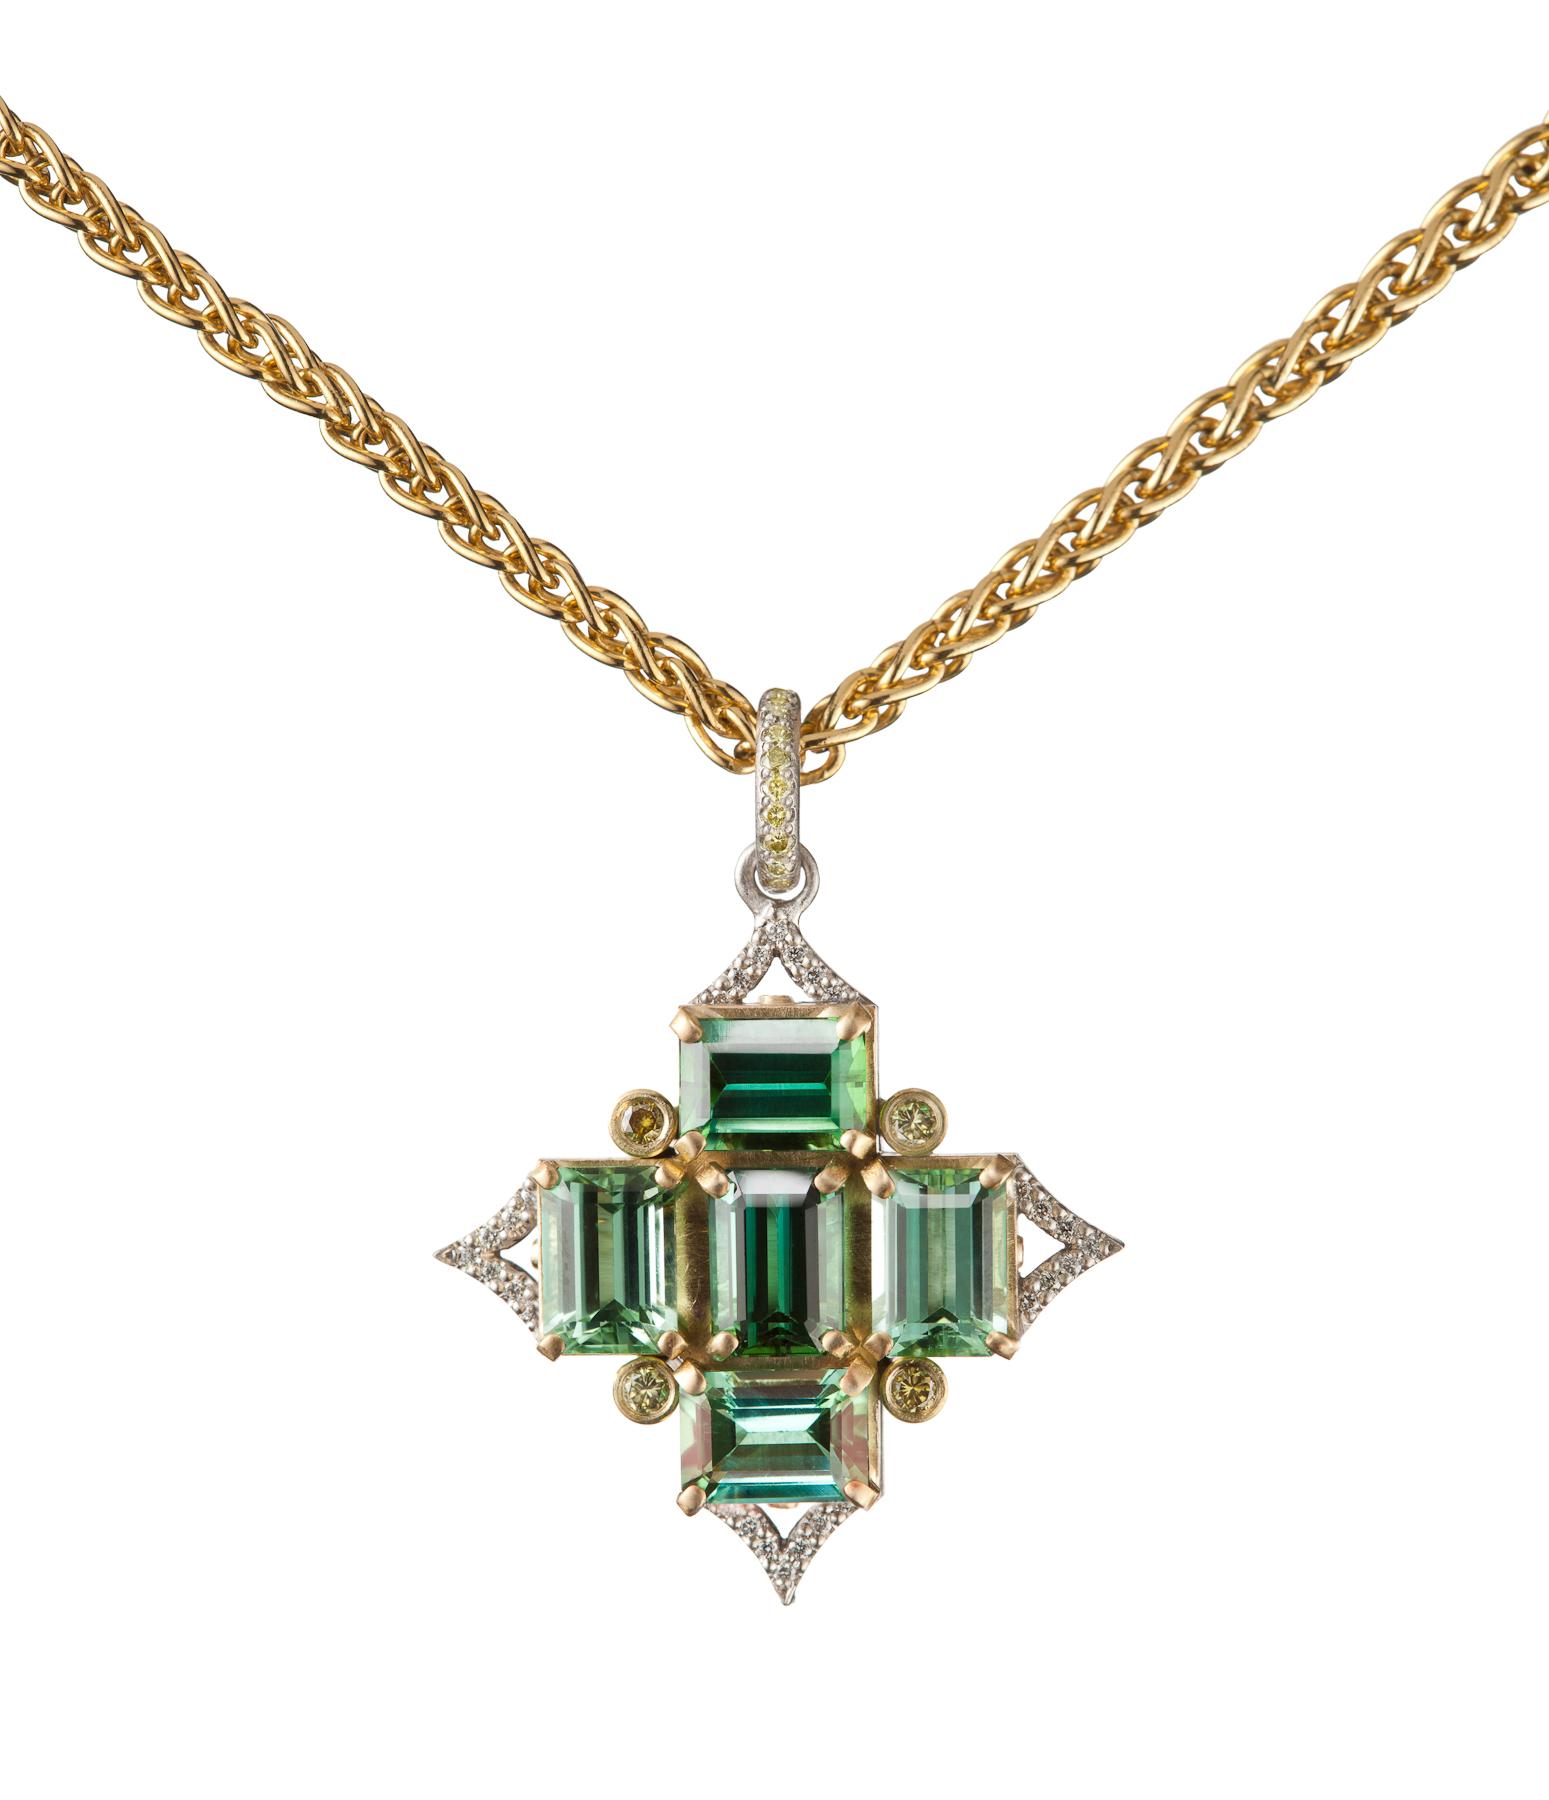 Green Tourmaline Pendant in Platinum & 18K Gold with Yellow-Green Diamonds